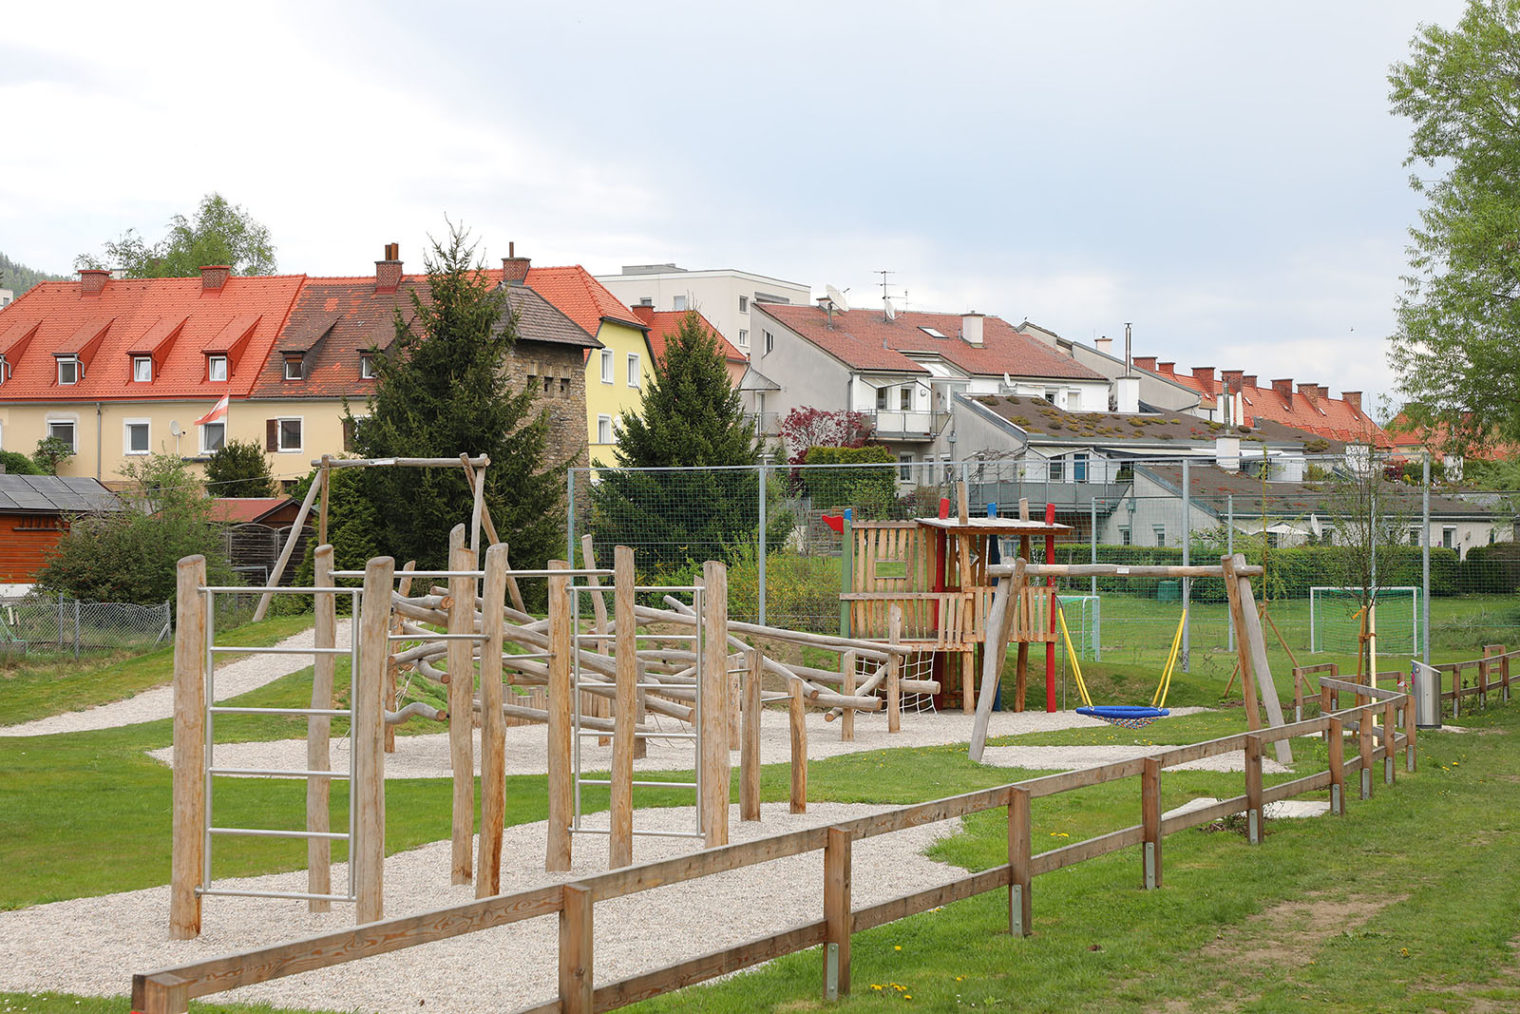 play equipment at the Prolebersiedlung playground